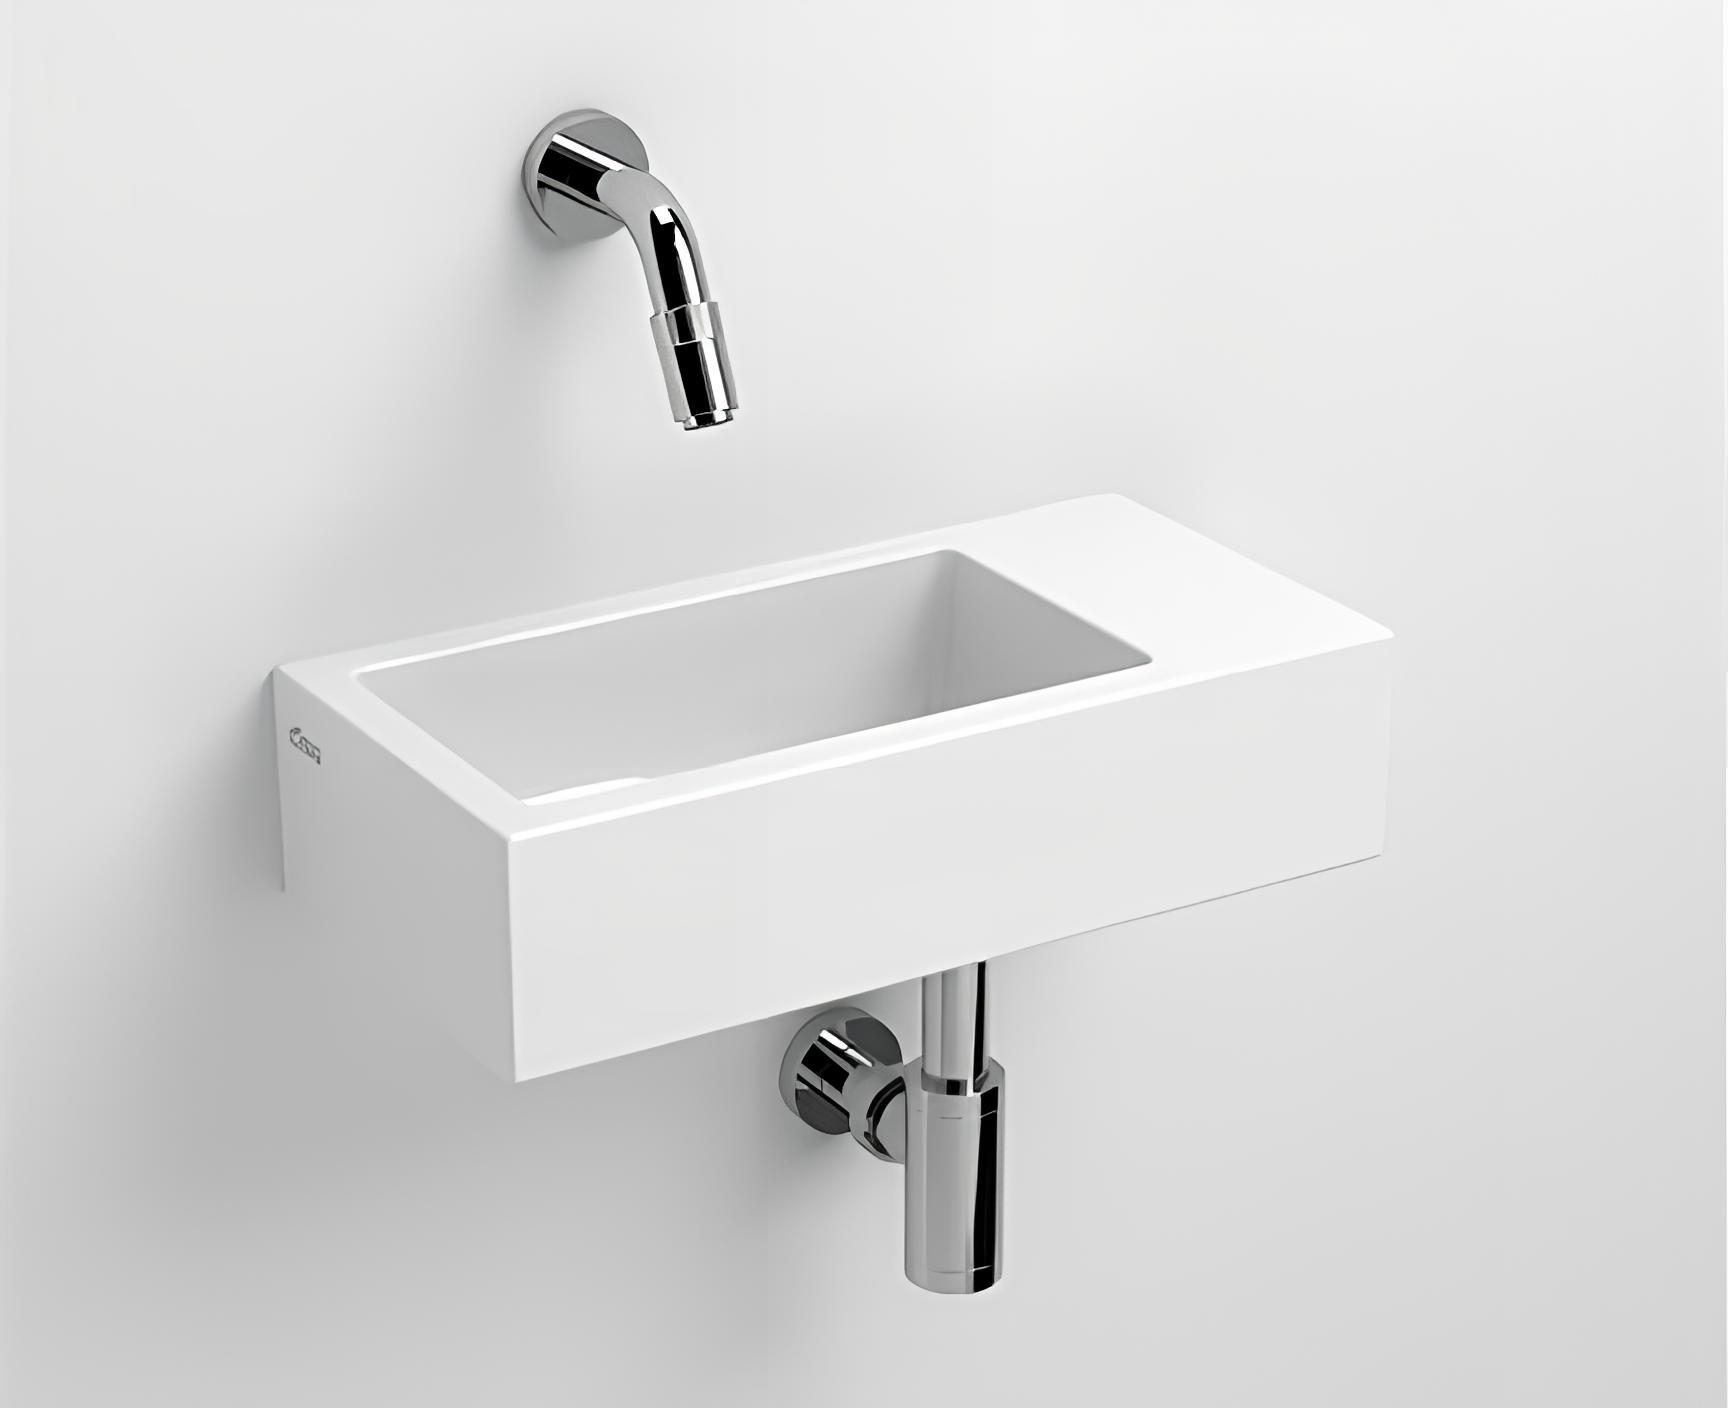 waschbecken h ngend flush 360 x 180 x 90 wei perfecto design. Black Bedroom Furniture Sets. Home Design Ideas